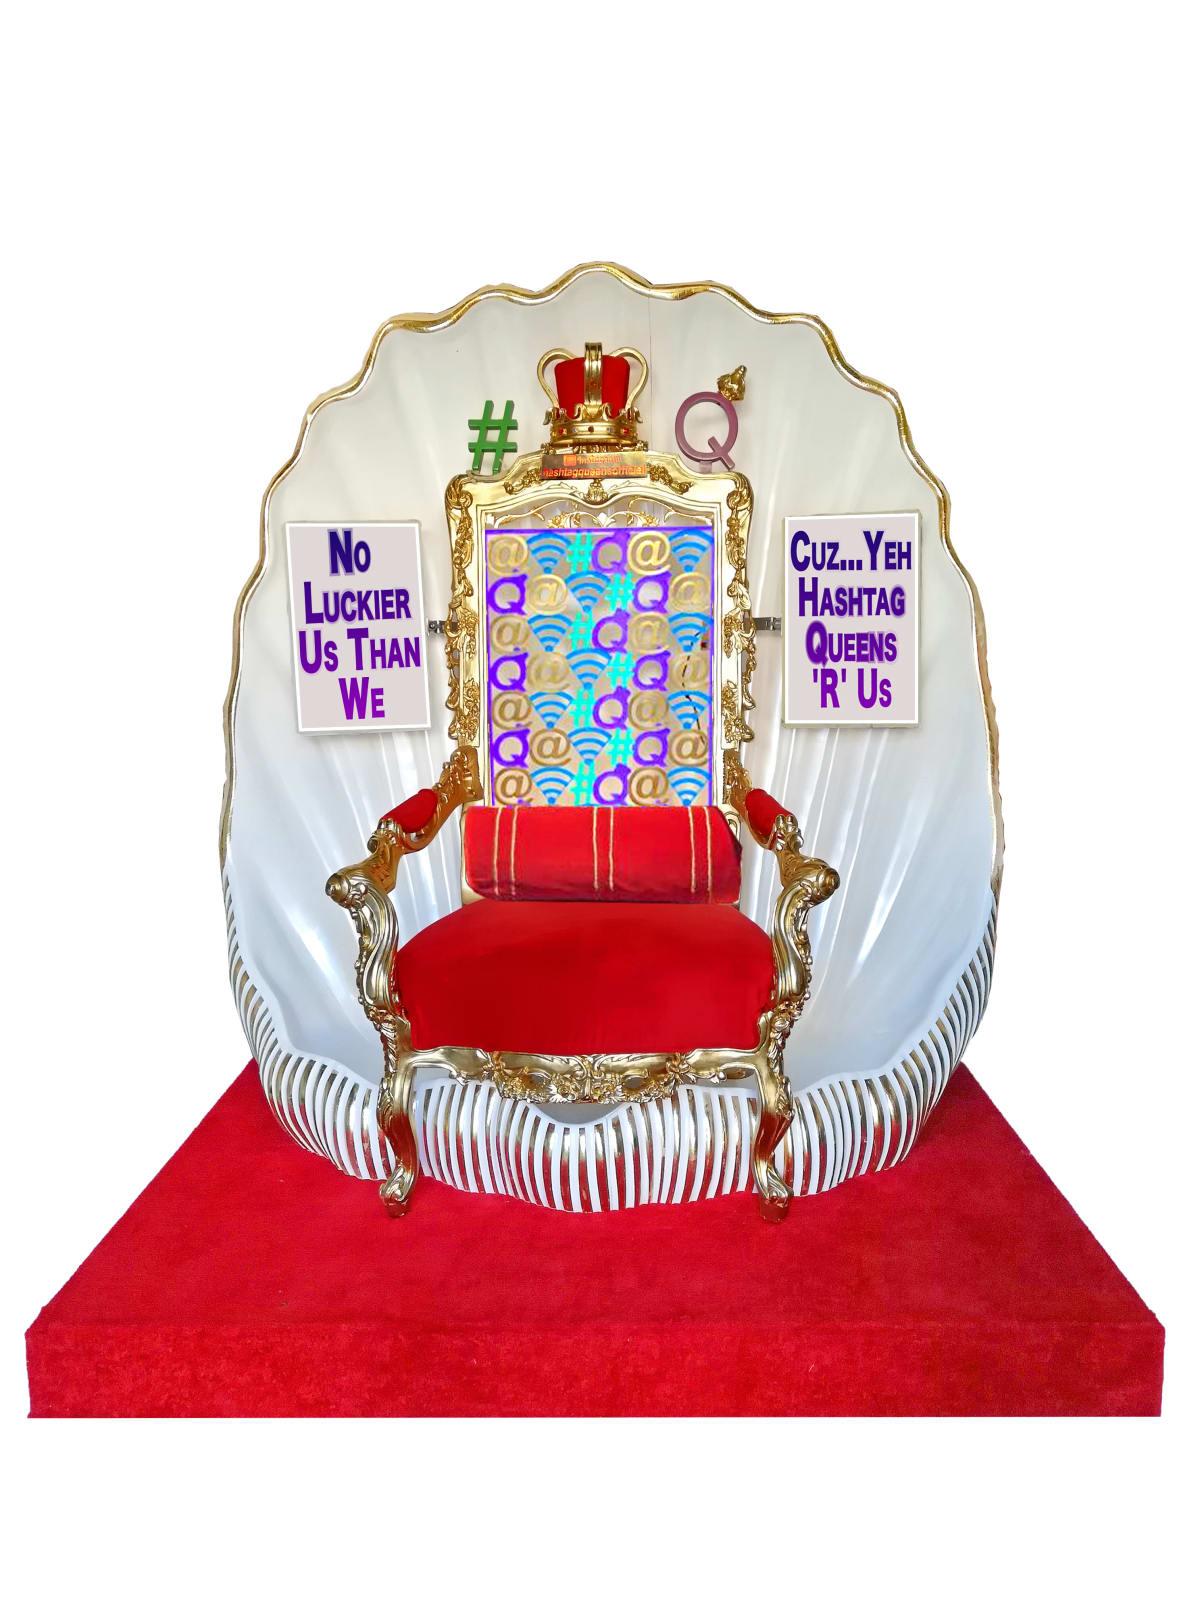 Robodrone Hashtag Queens throne, 2018 Mix Media 196 x 180 x 130 cm